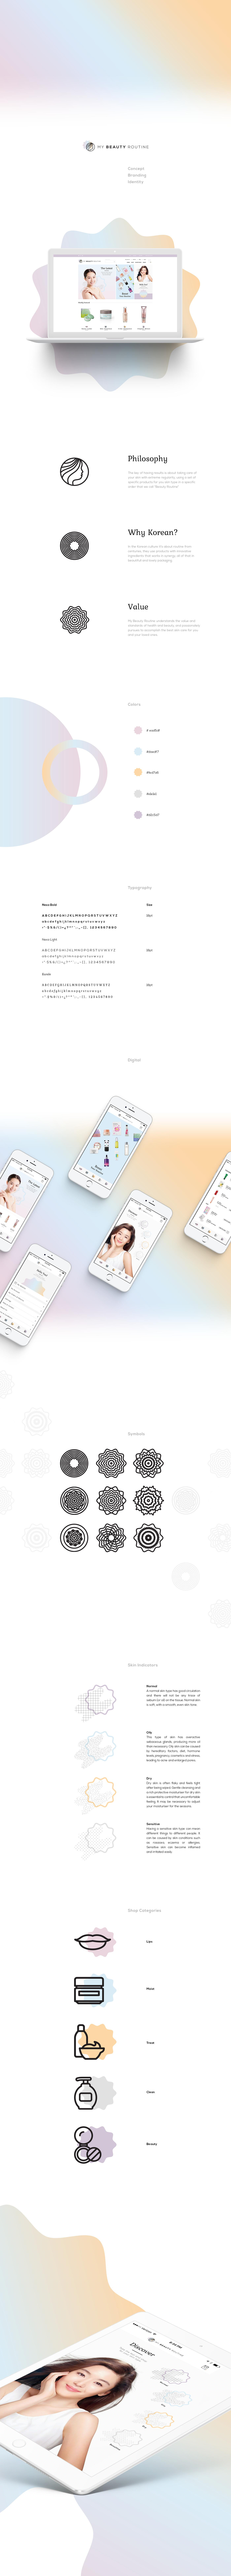 korean beauty skincare skin makeup mask face Routine gradient